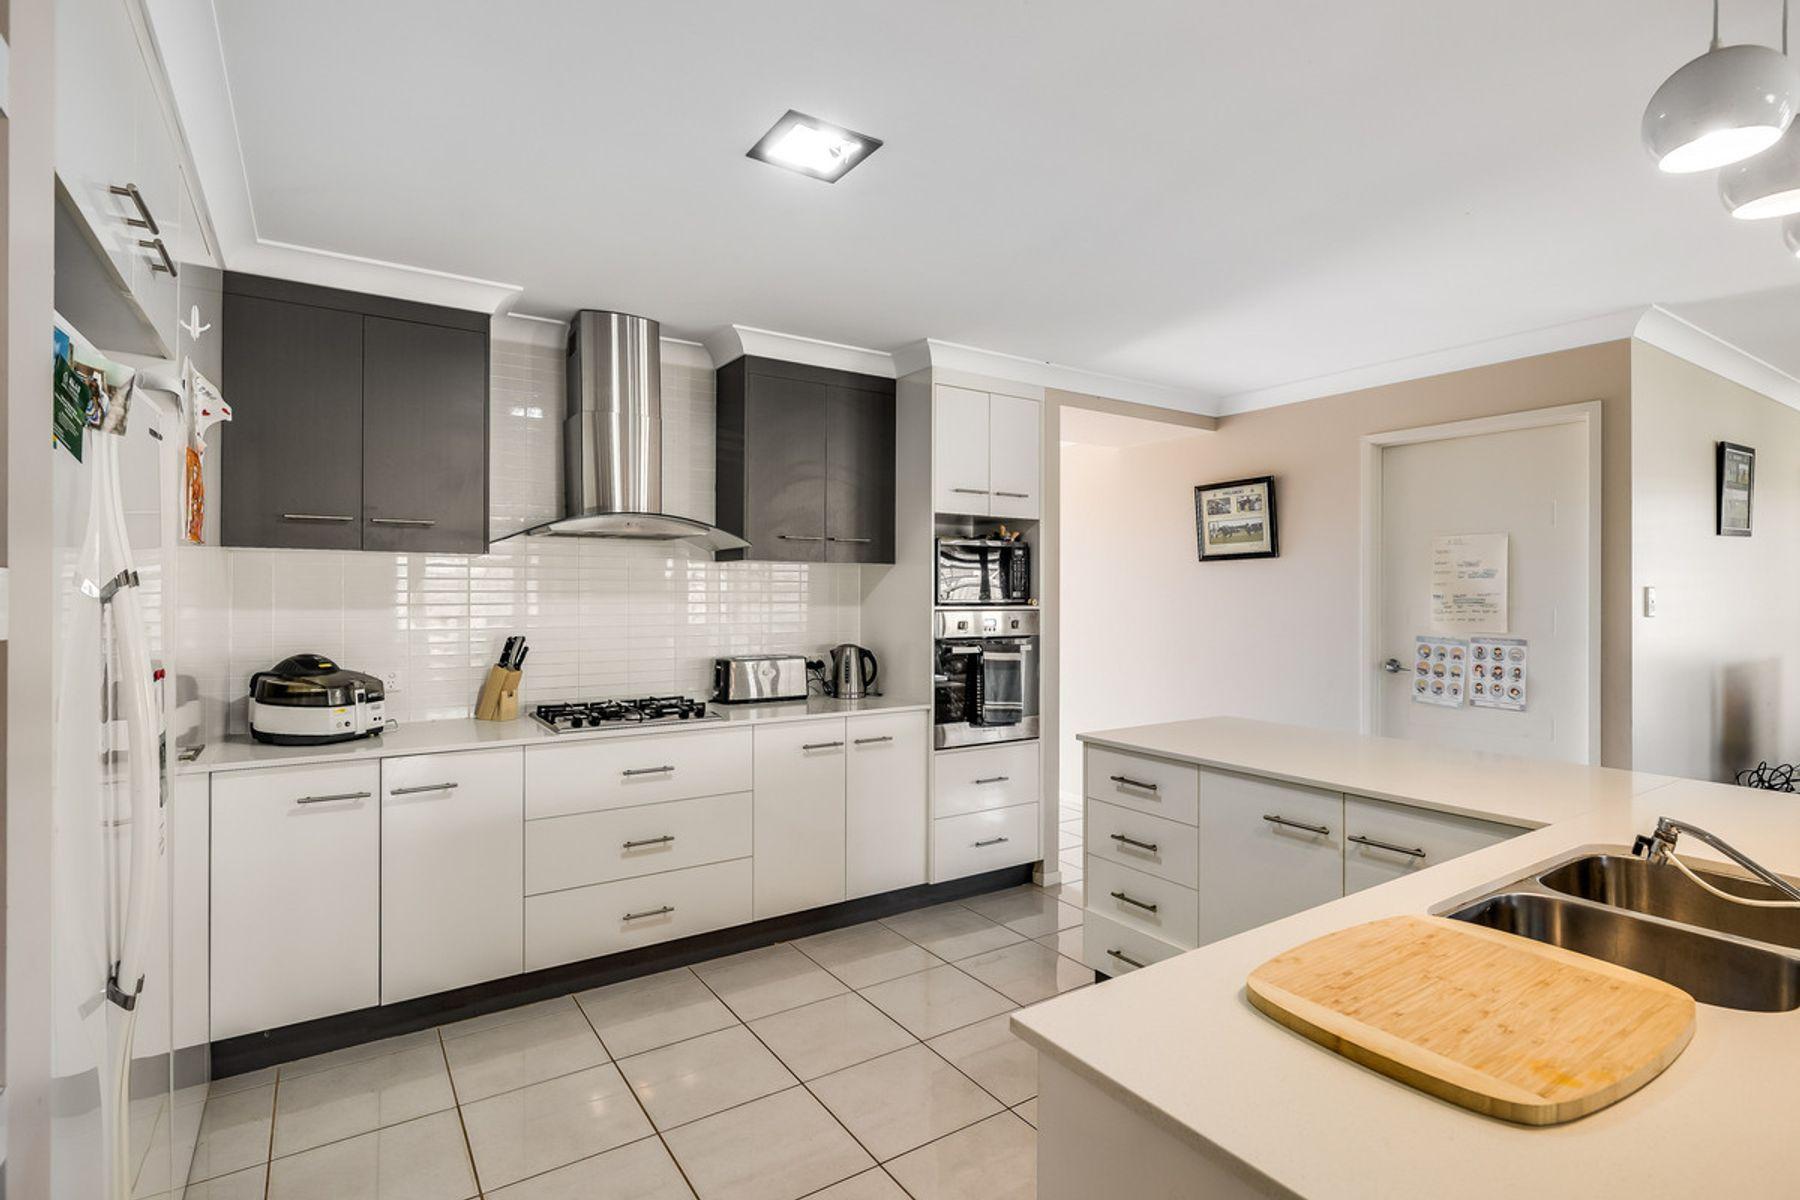 12 Graves Drive, Kearneys Spring, QLD 4350